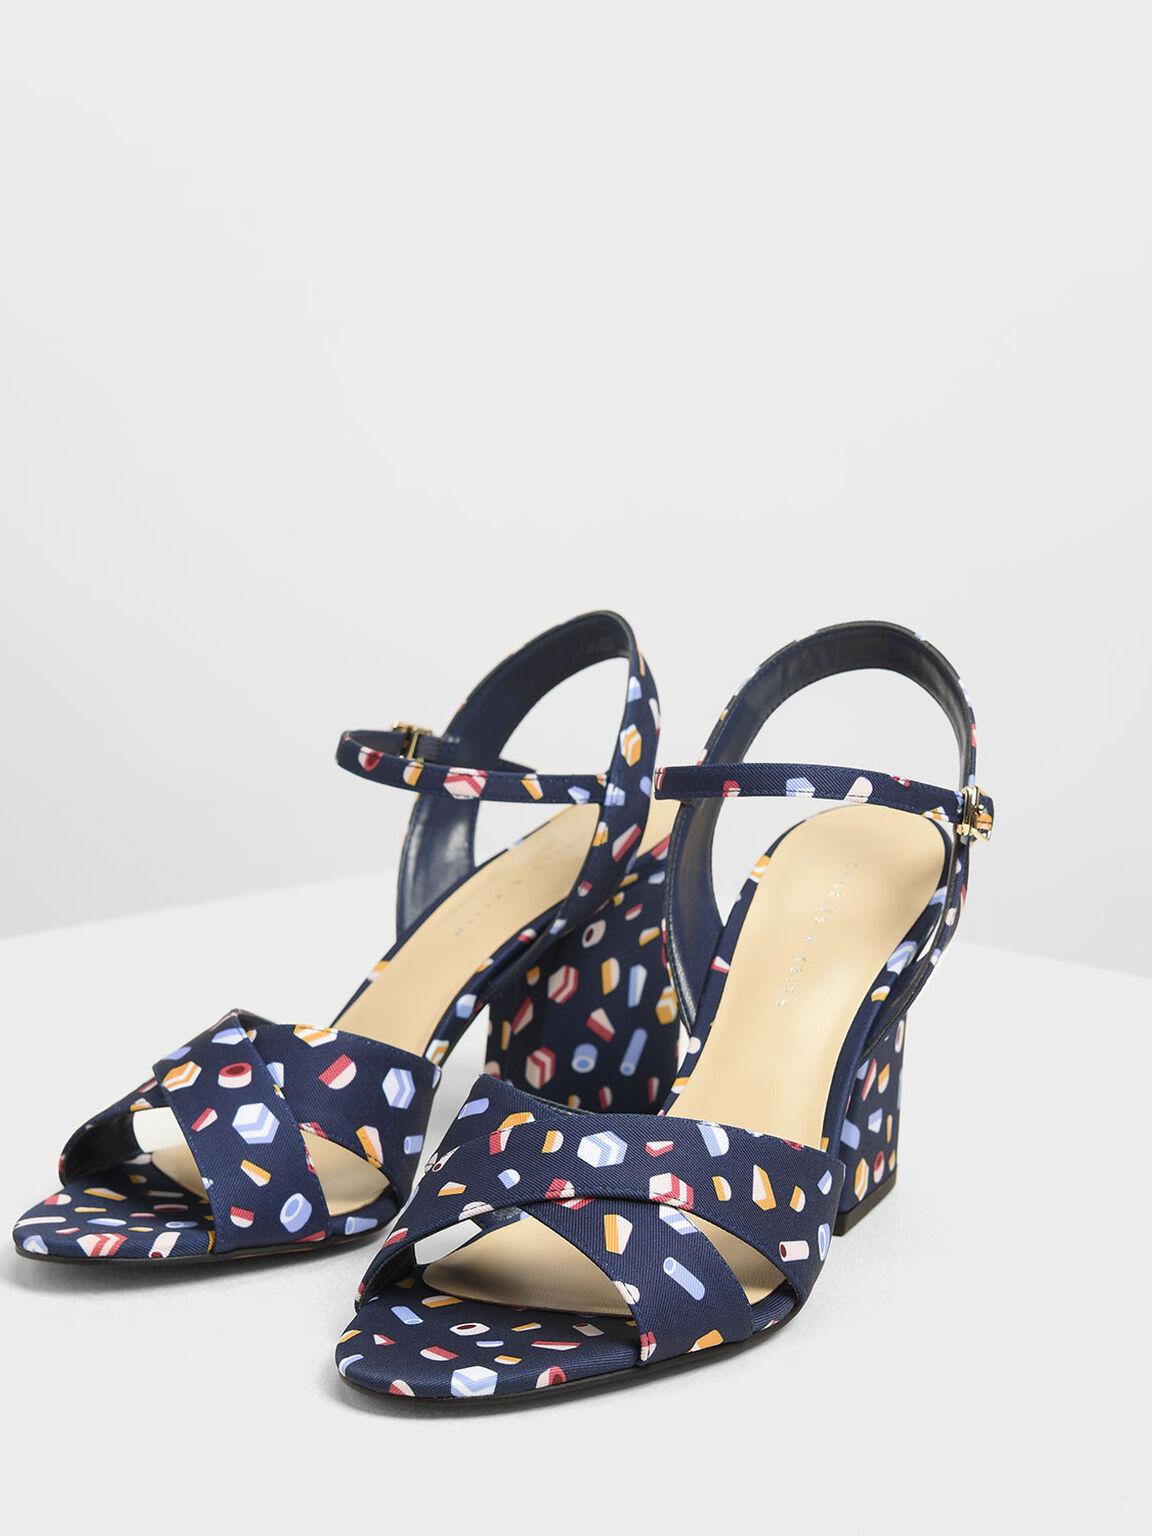 Criss Cross Printed Block Heel Sandals, Dark Blue, hi-res